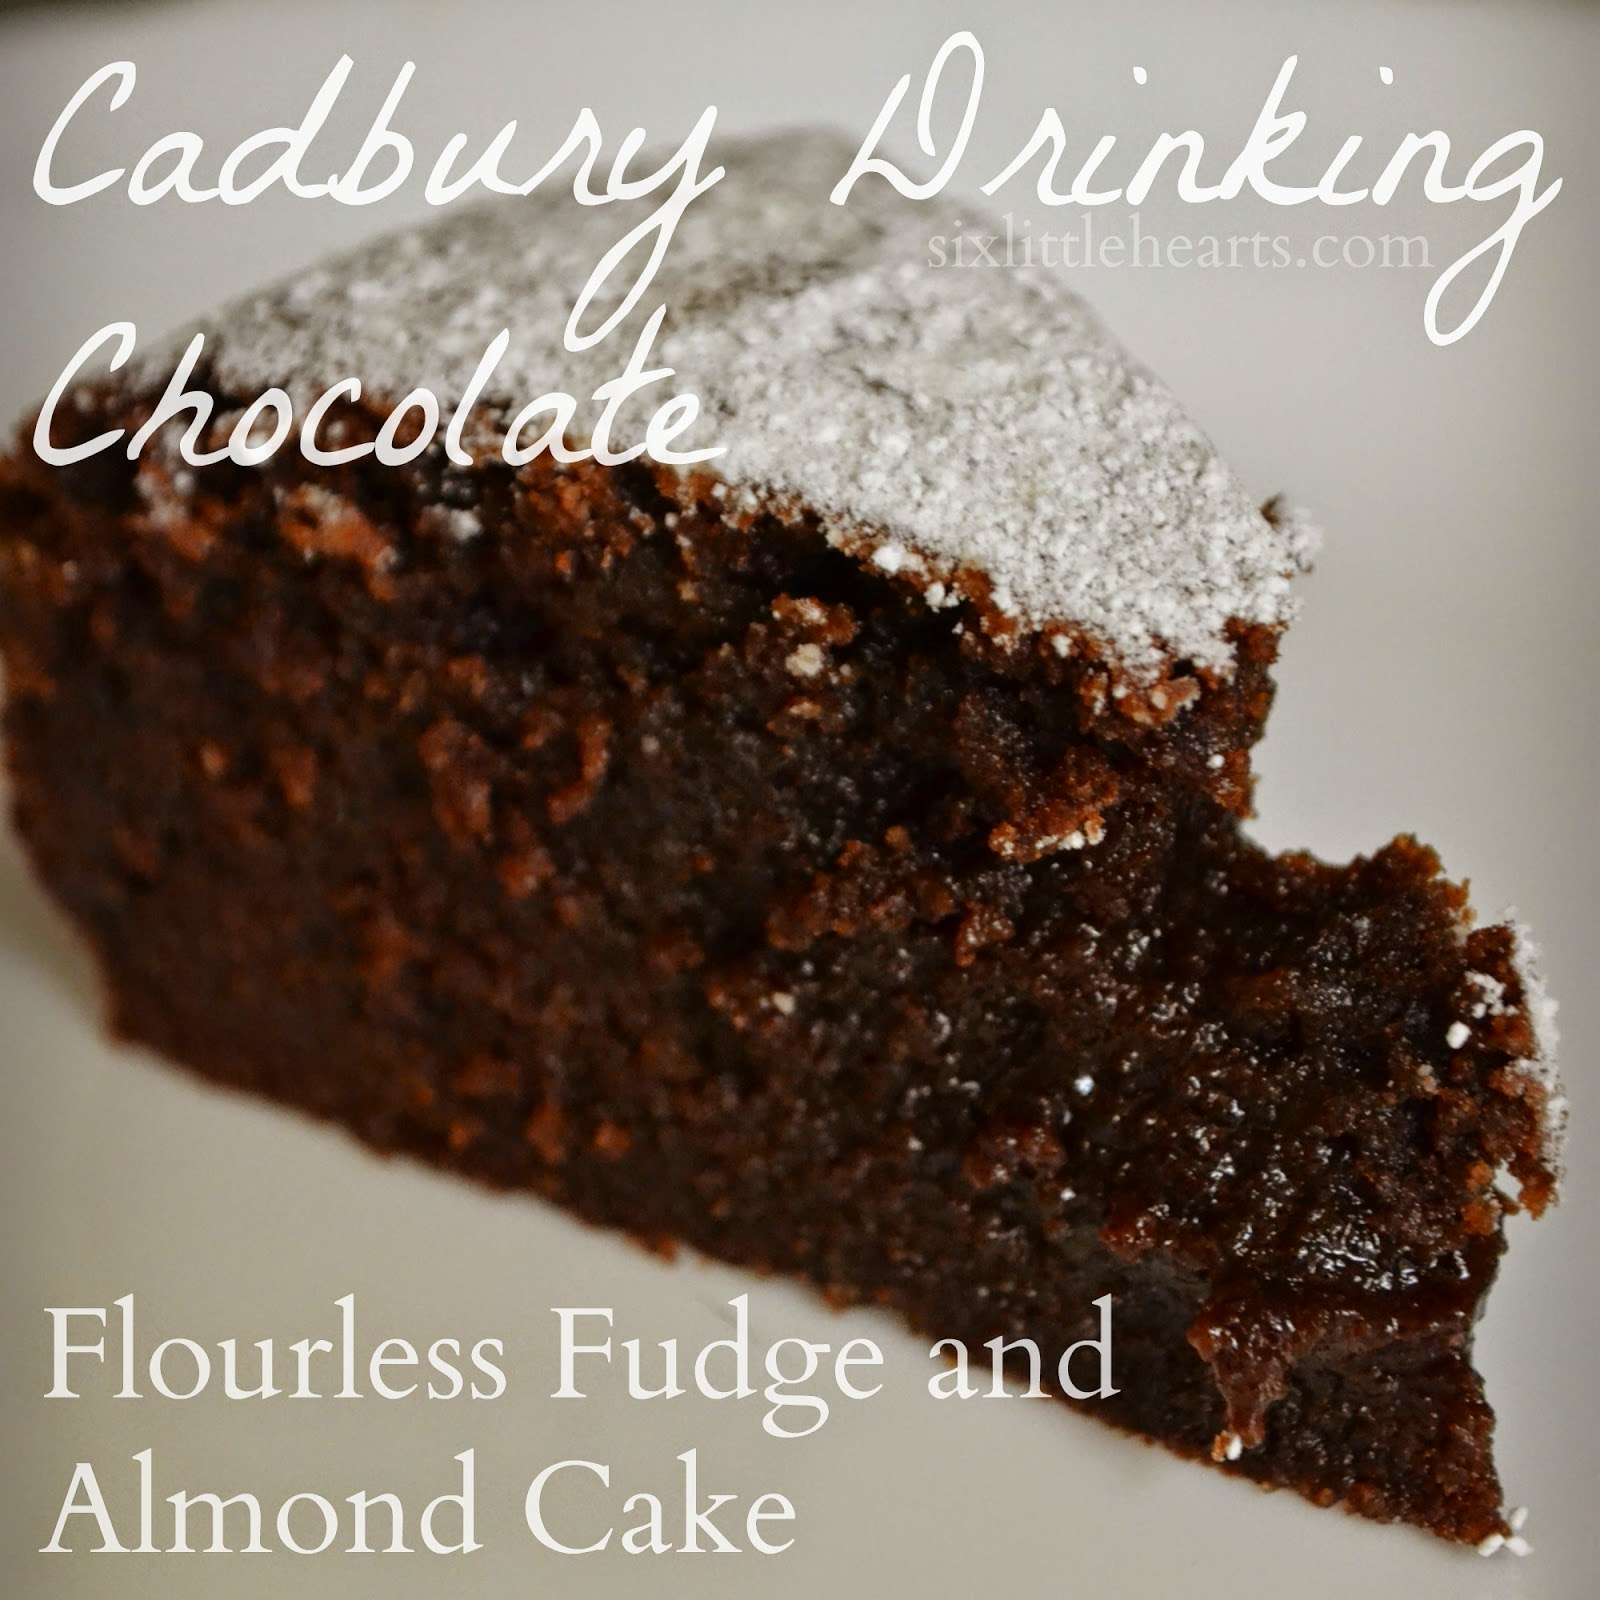 Cadbury S Drinking Chocolate Cake Recipe